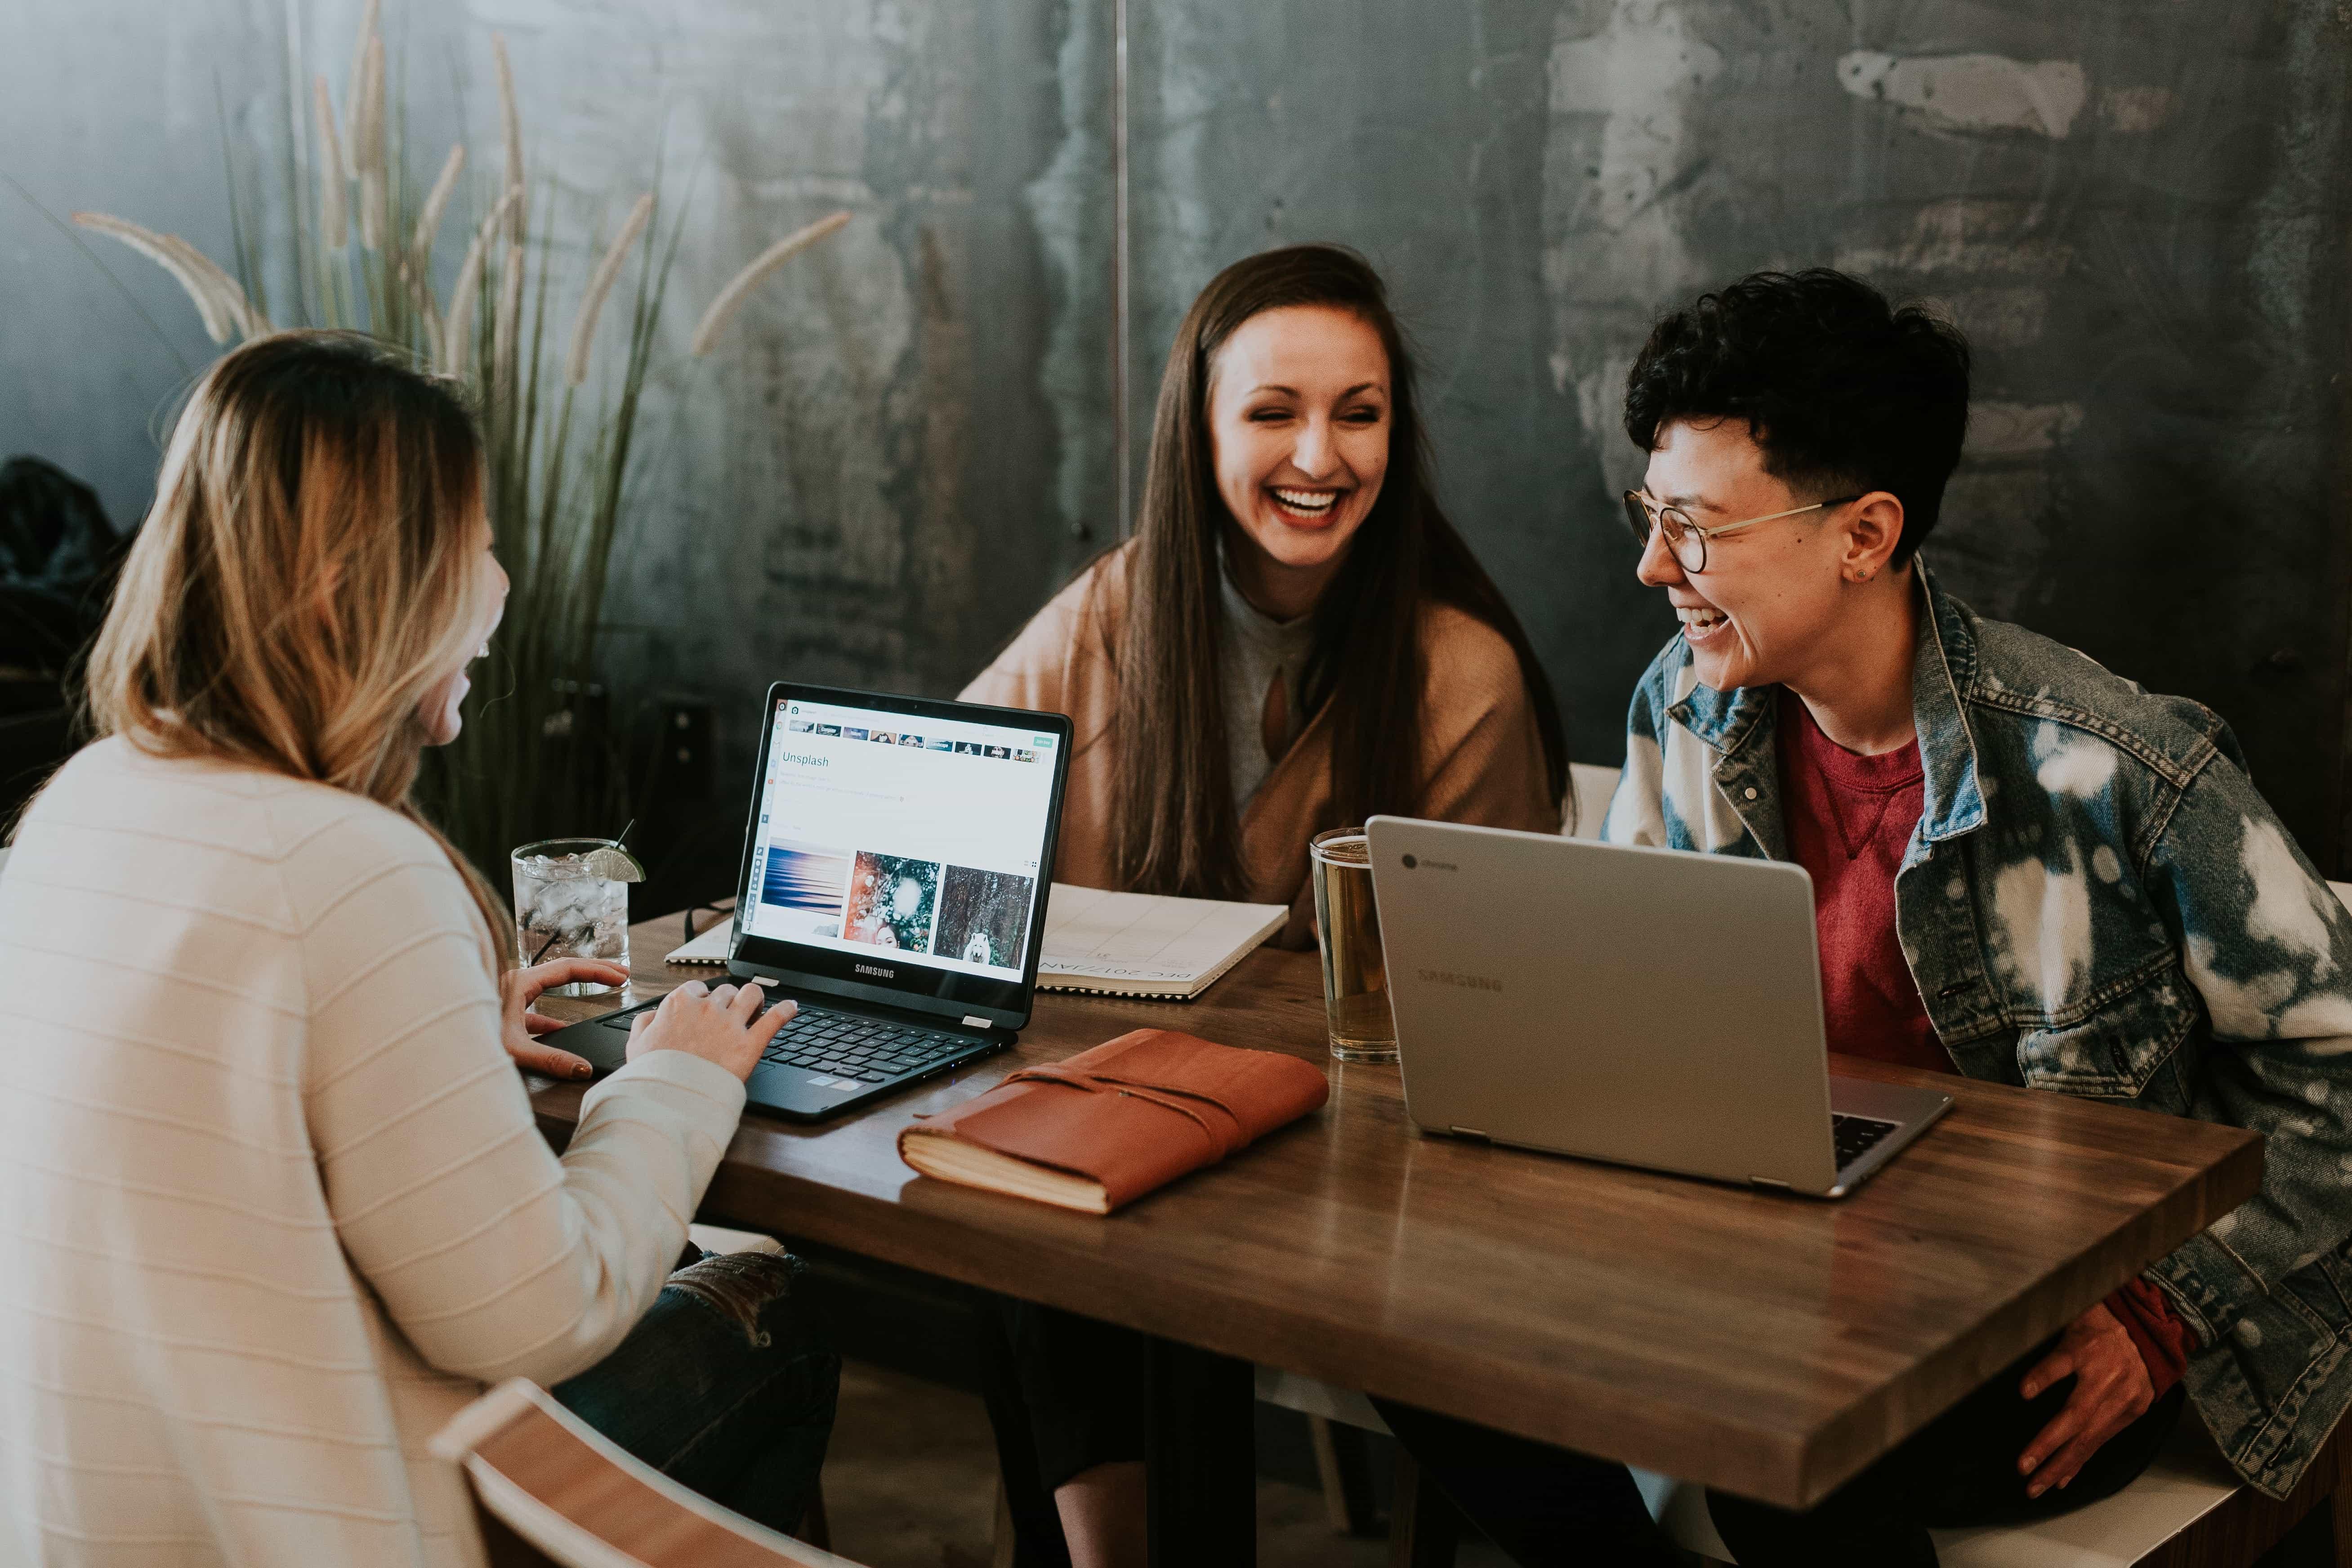 VR in Corporate Design: Encouraging Inclusivity through Empathy and Understanding